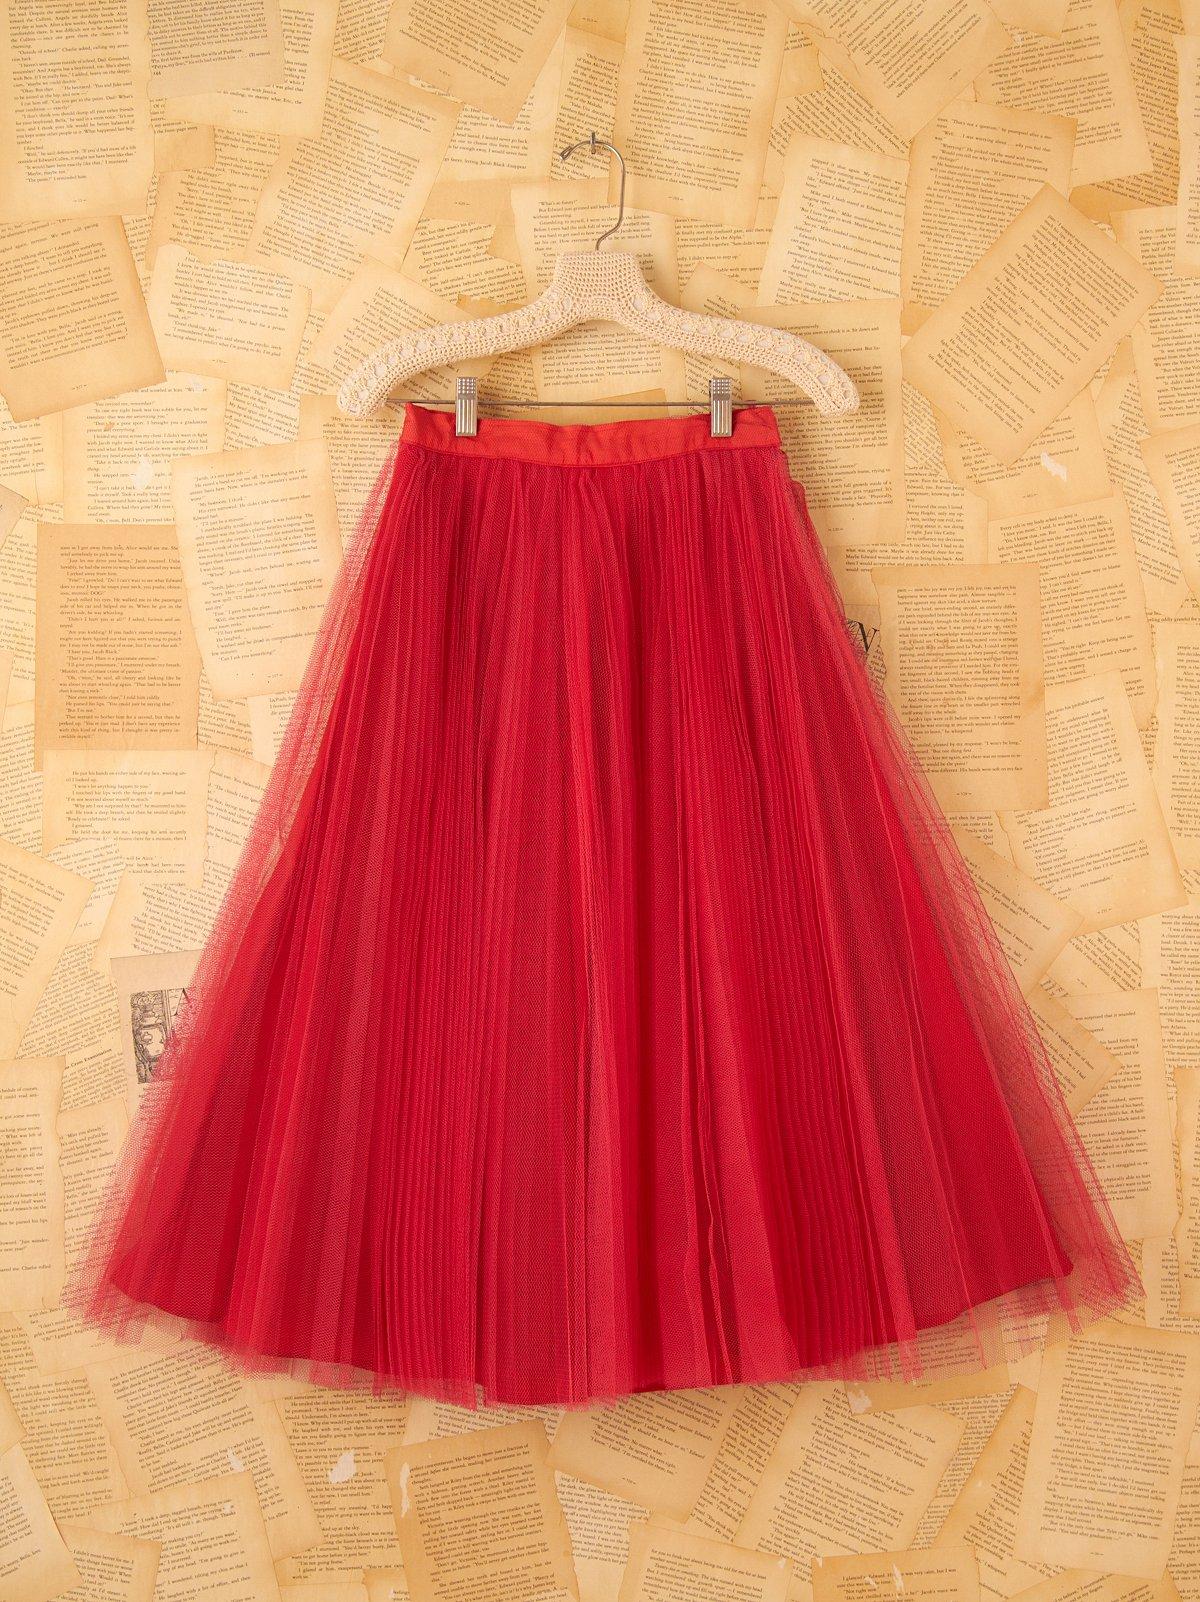 Vintage 1950s High Waisted Red Crinoline Skirt